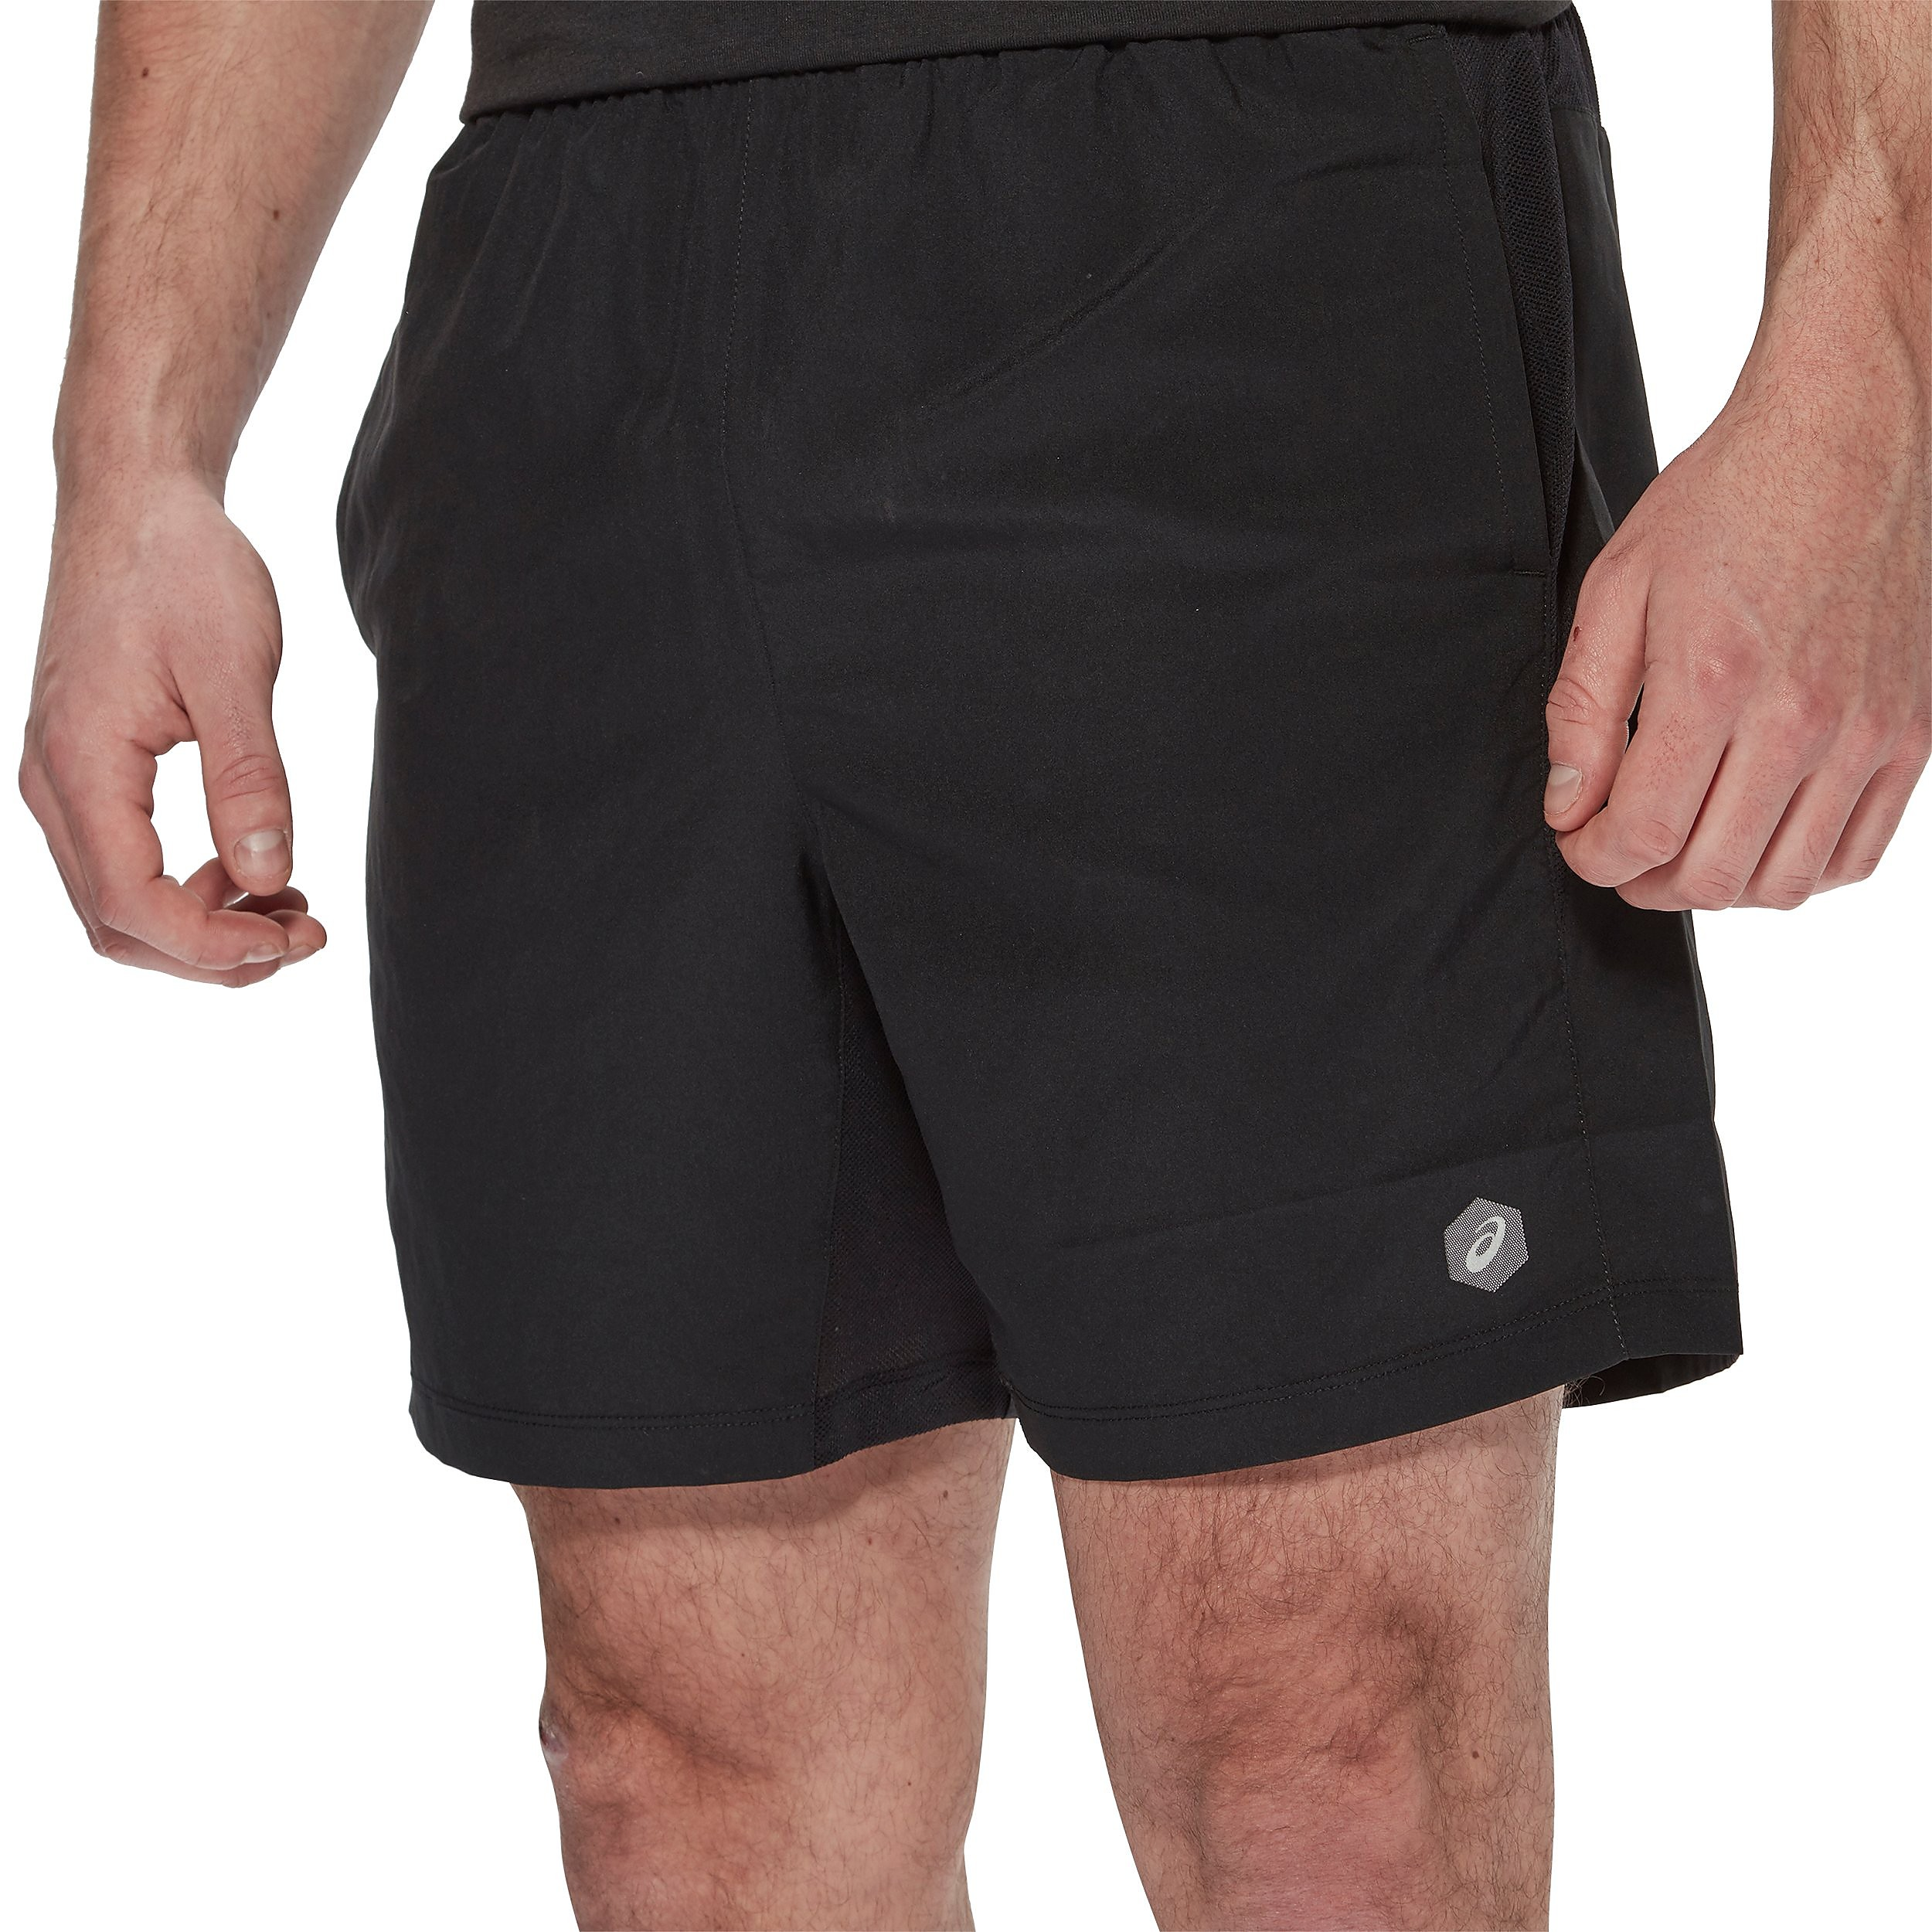 Asics True Performance Men's Shorts